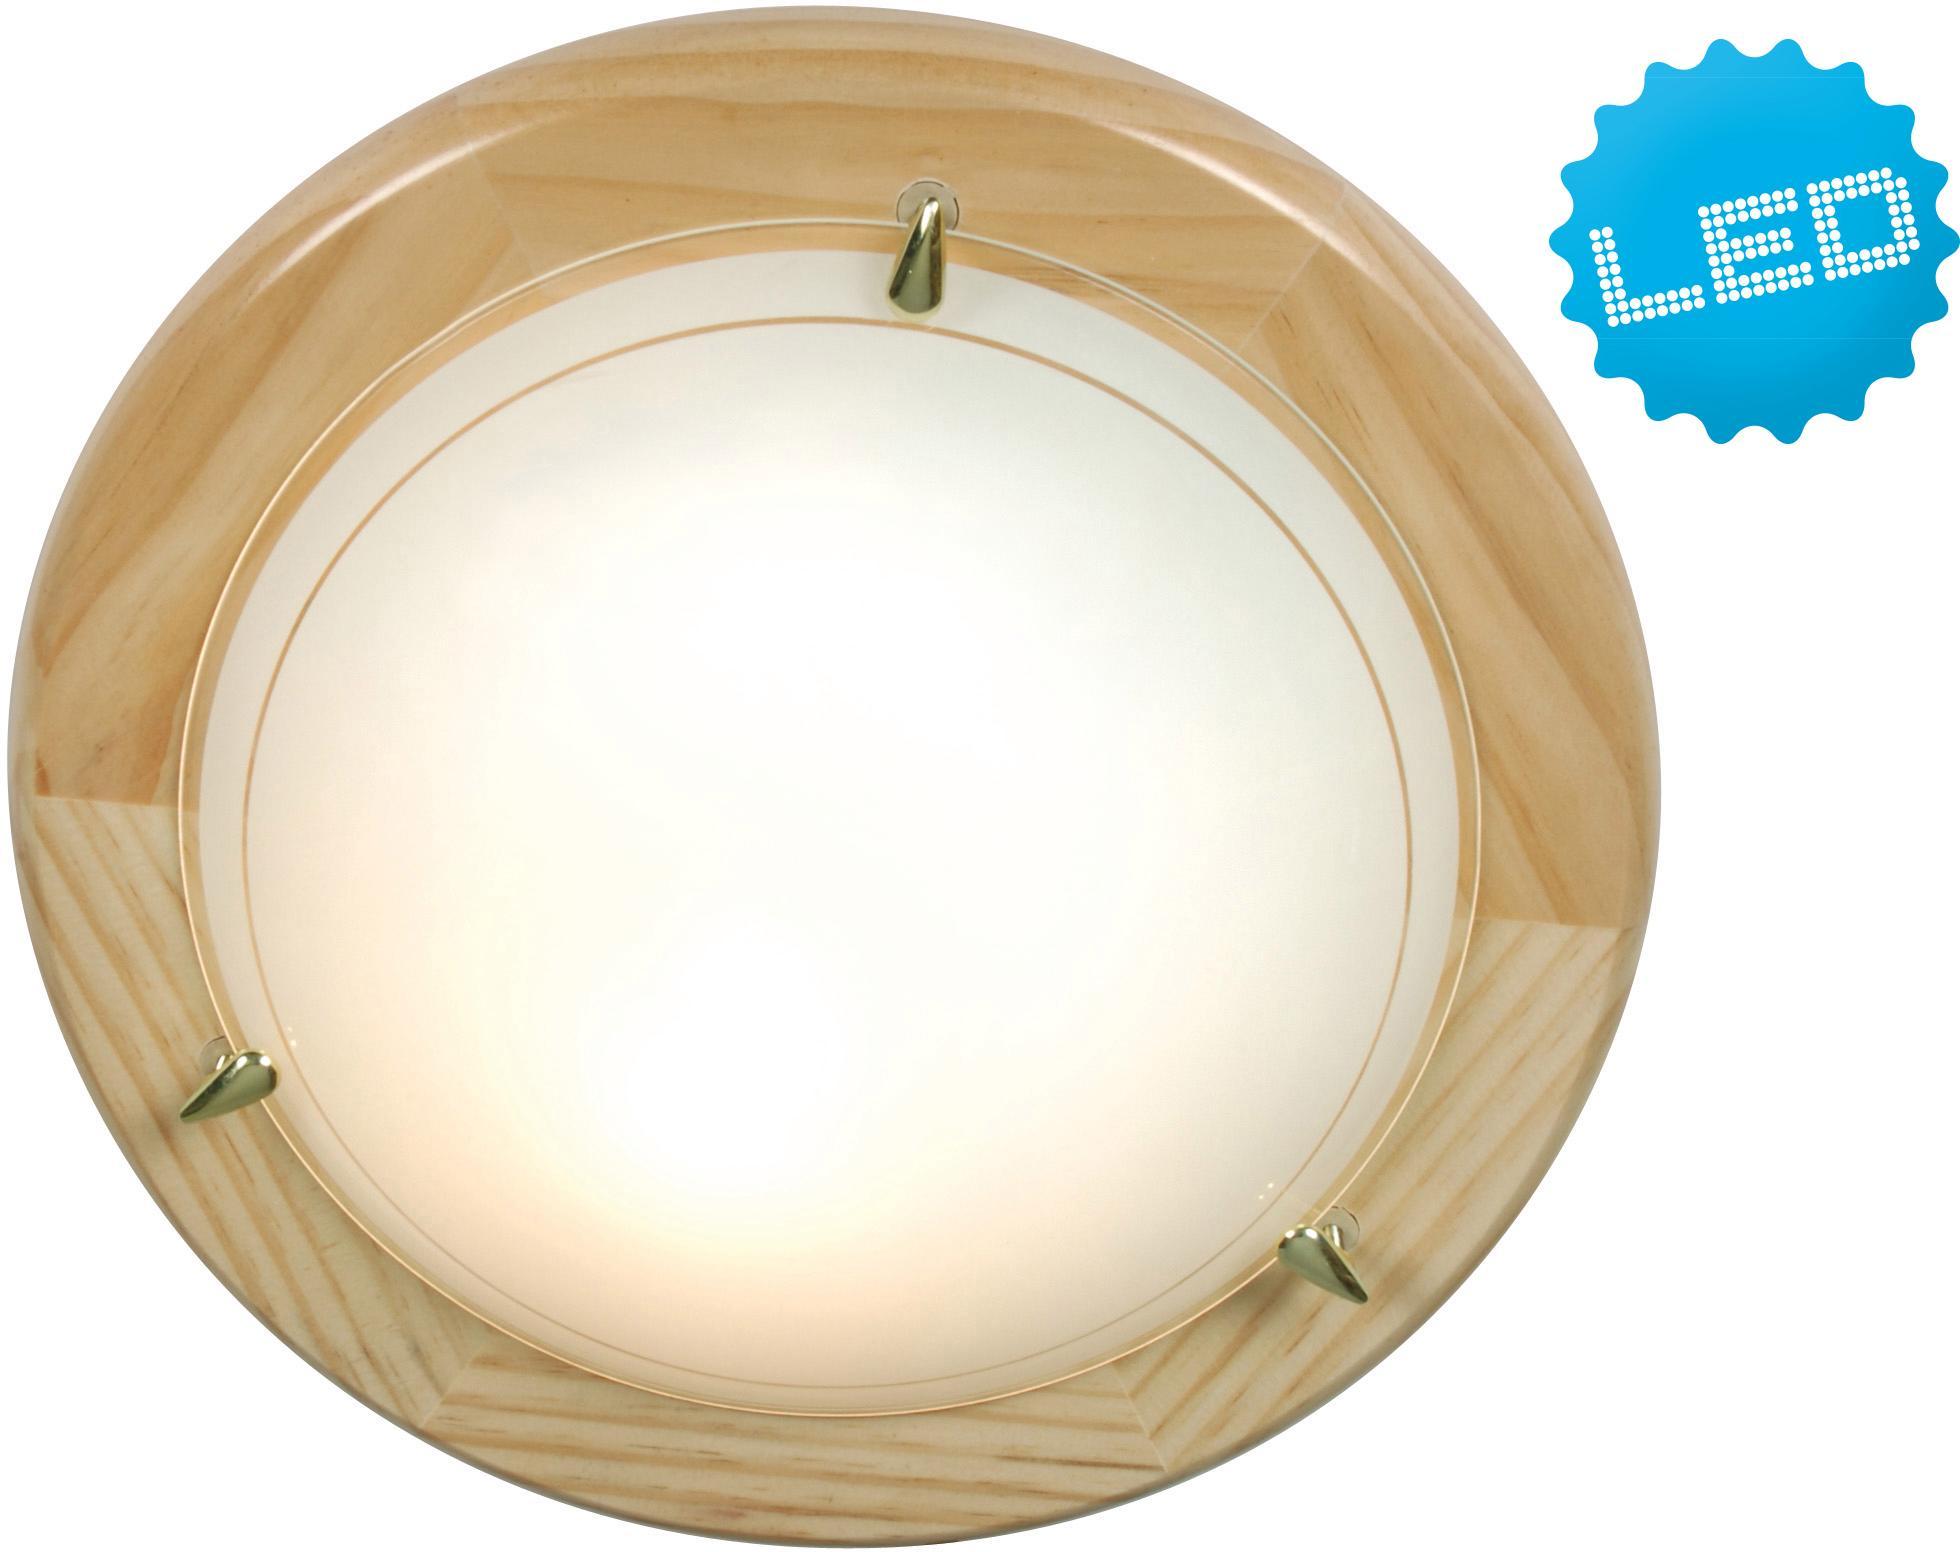 näve LED Deckenleuchte UFO